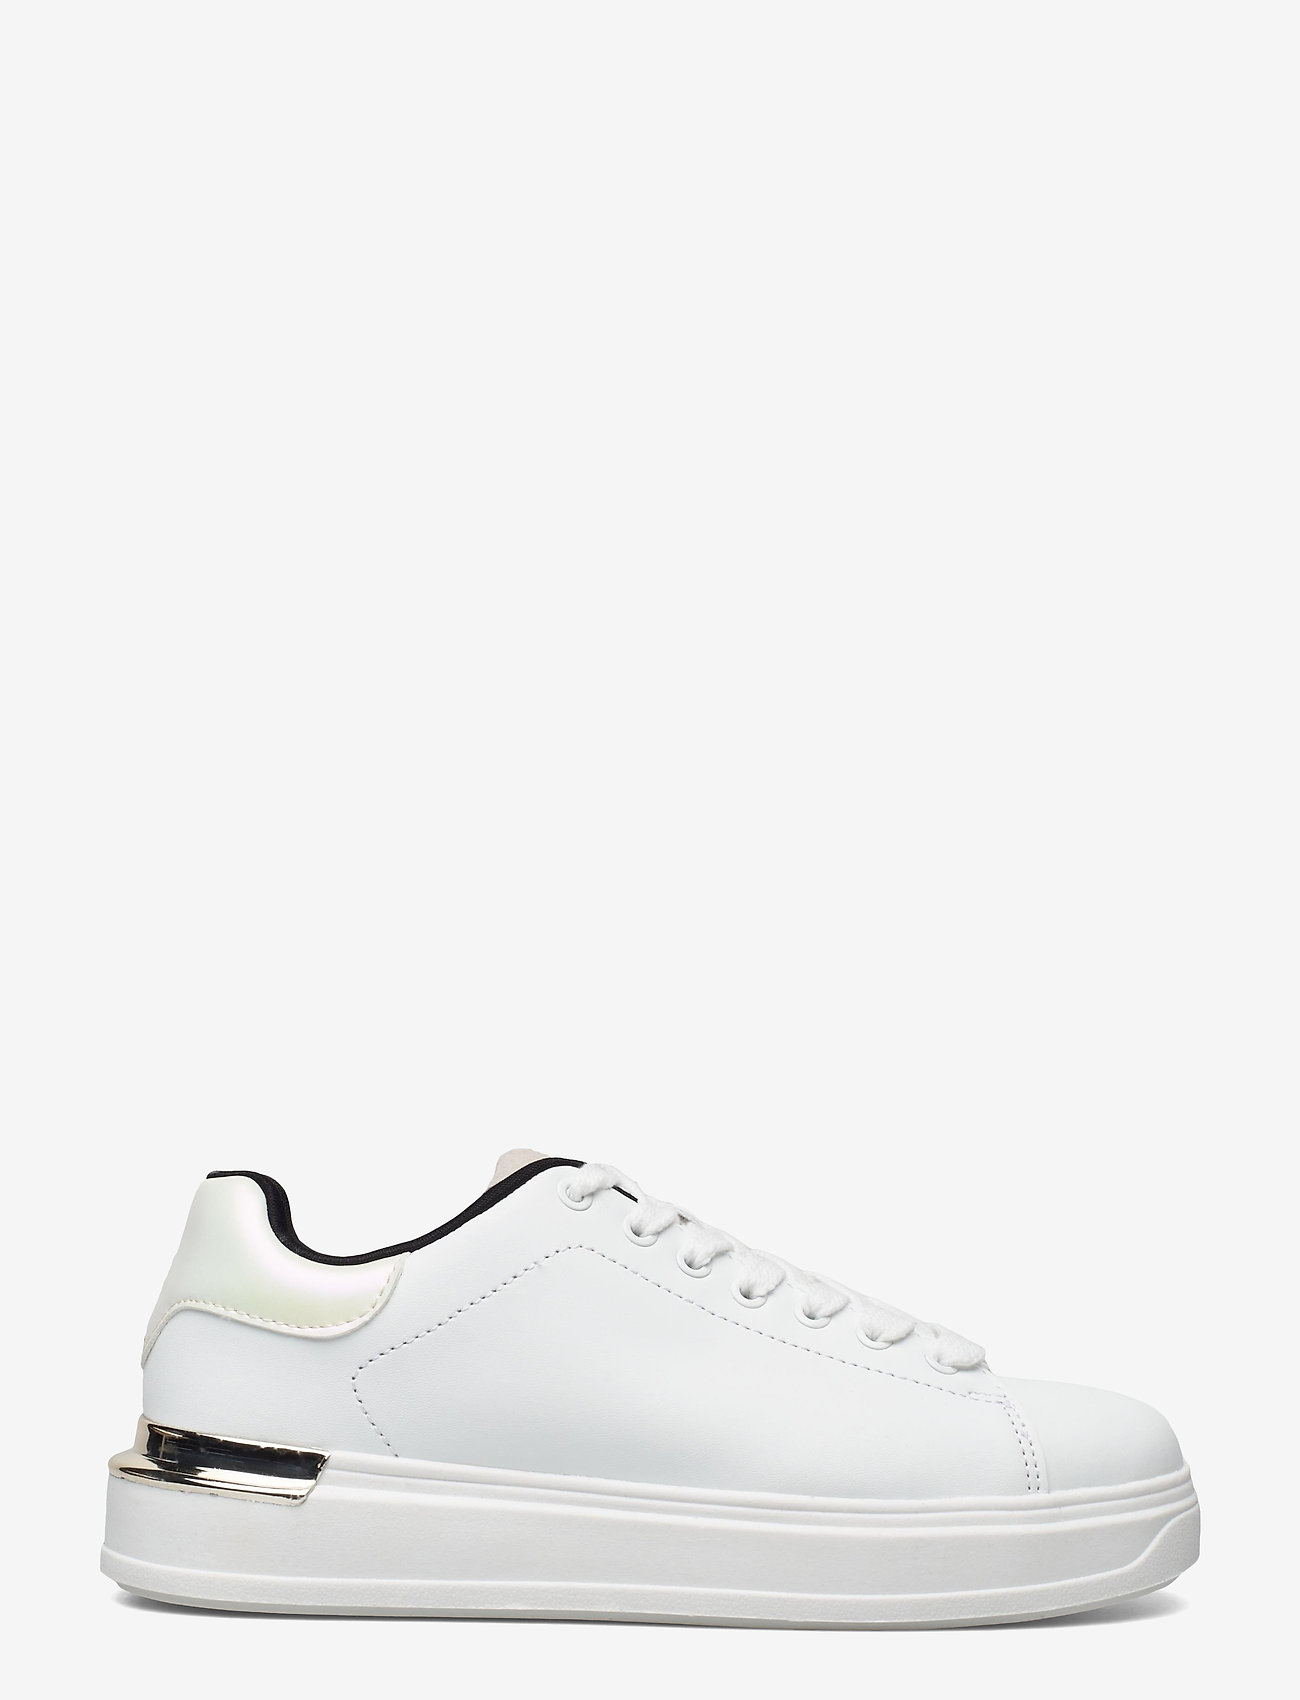 Vero Moda - VMMILANO SNEAKER - låga sneakers - snow white - 1